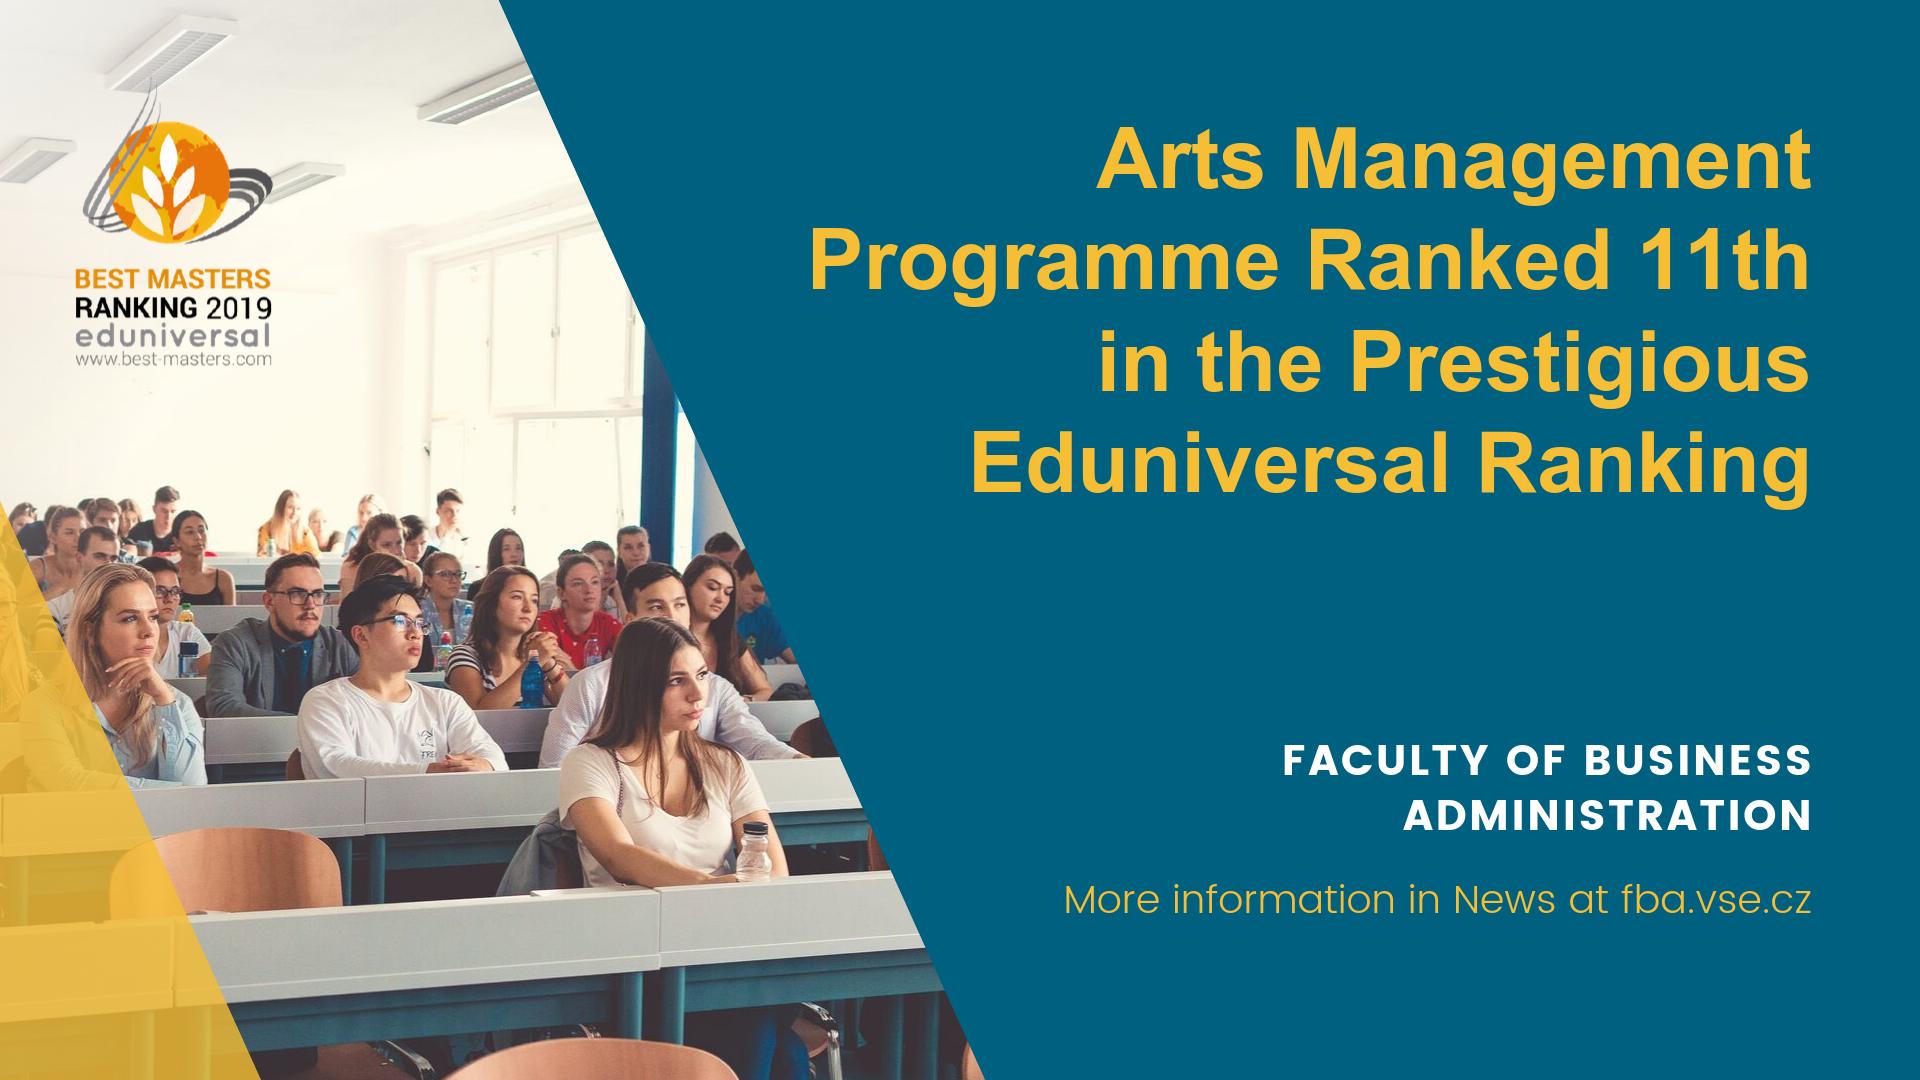 Arts management programme got 11th place in prestigious Eduniversal ranking